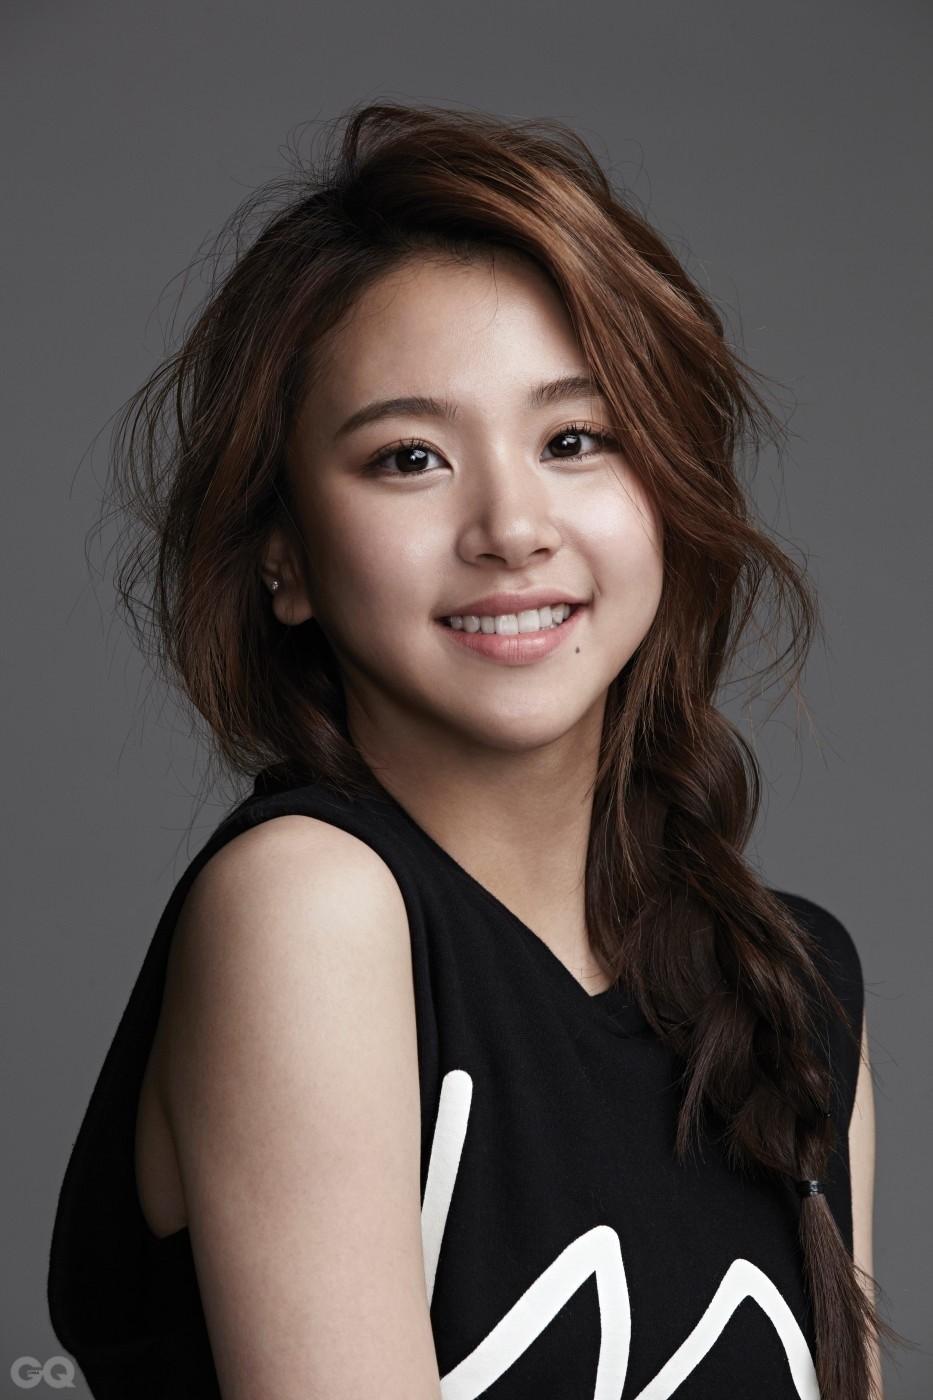 Twice : Chaeyoung